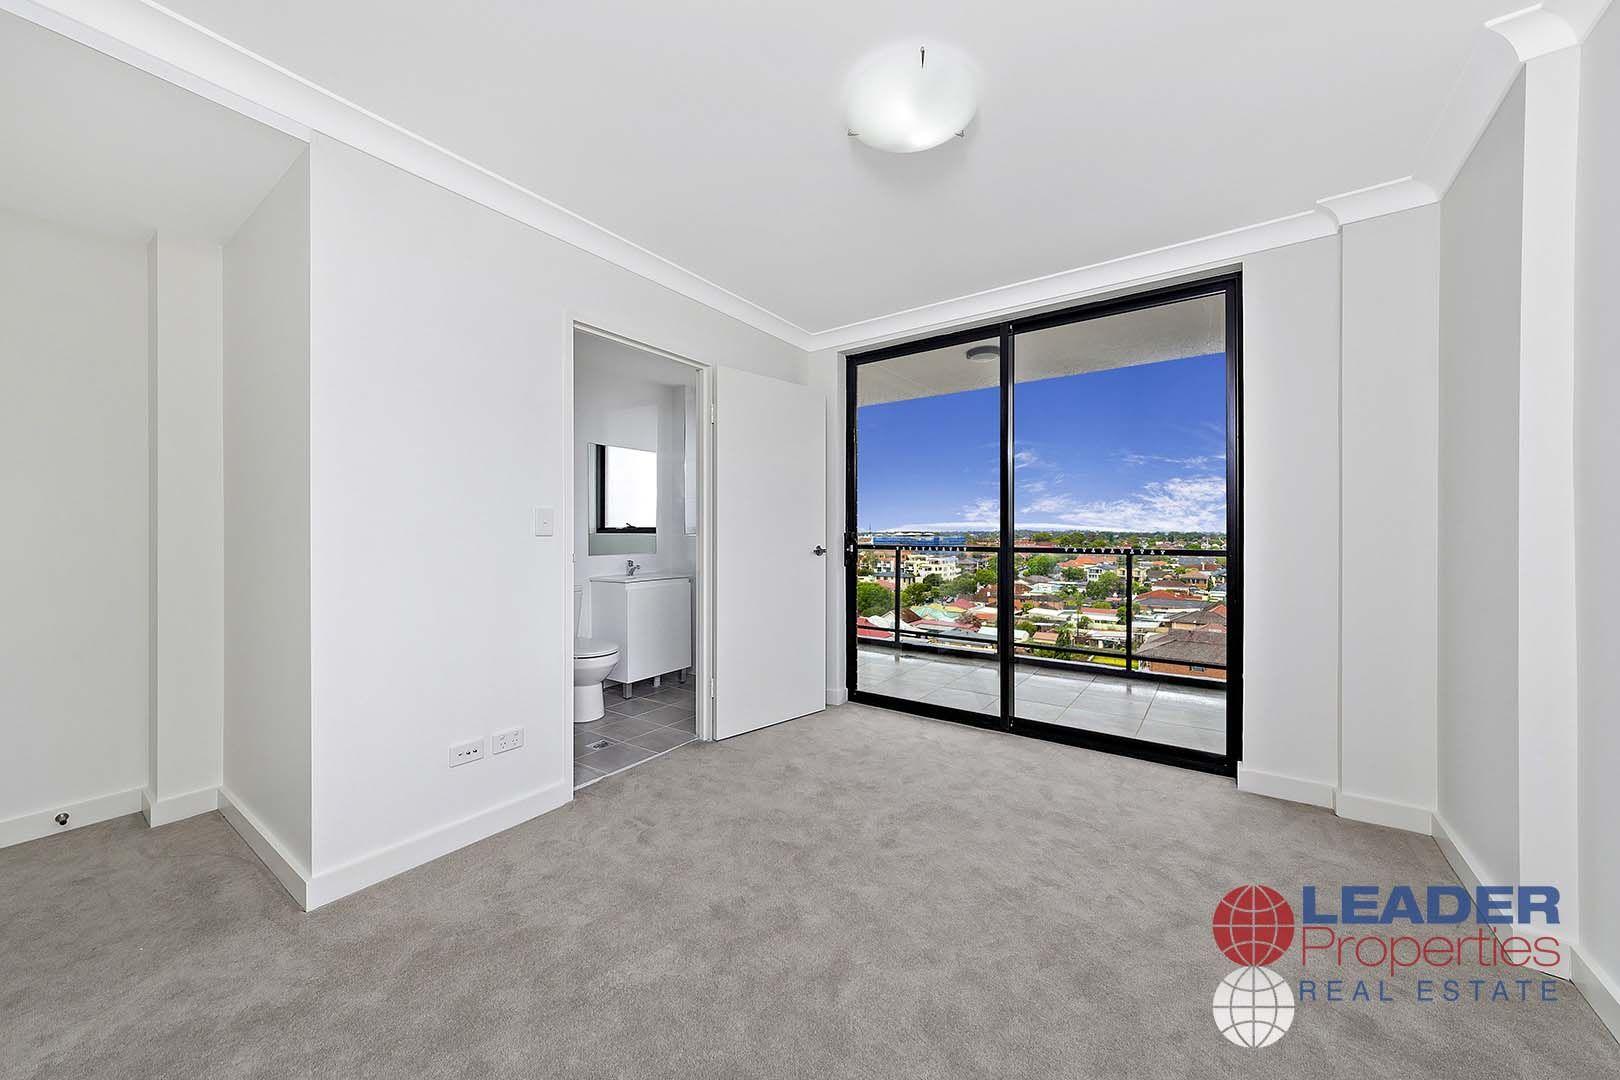 54/27-29 Mary Street, Auburn NSW 2144, Image 8